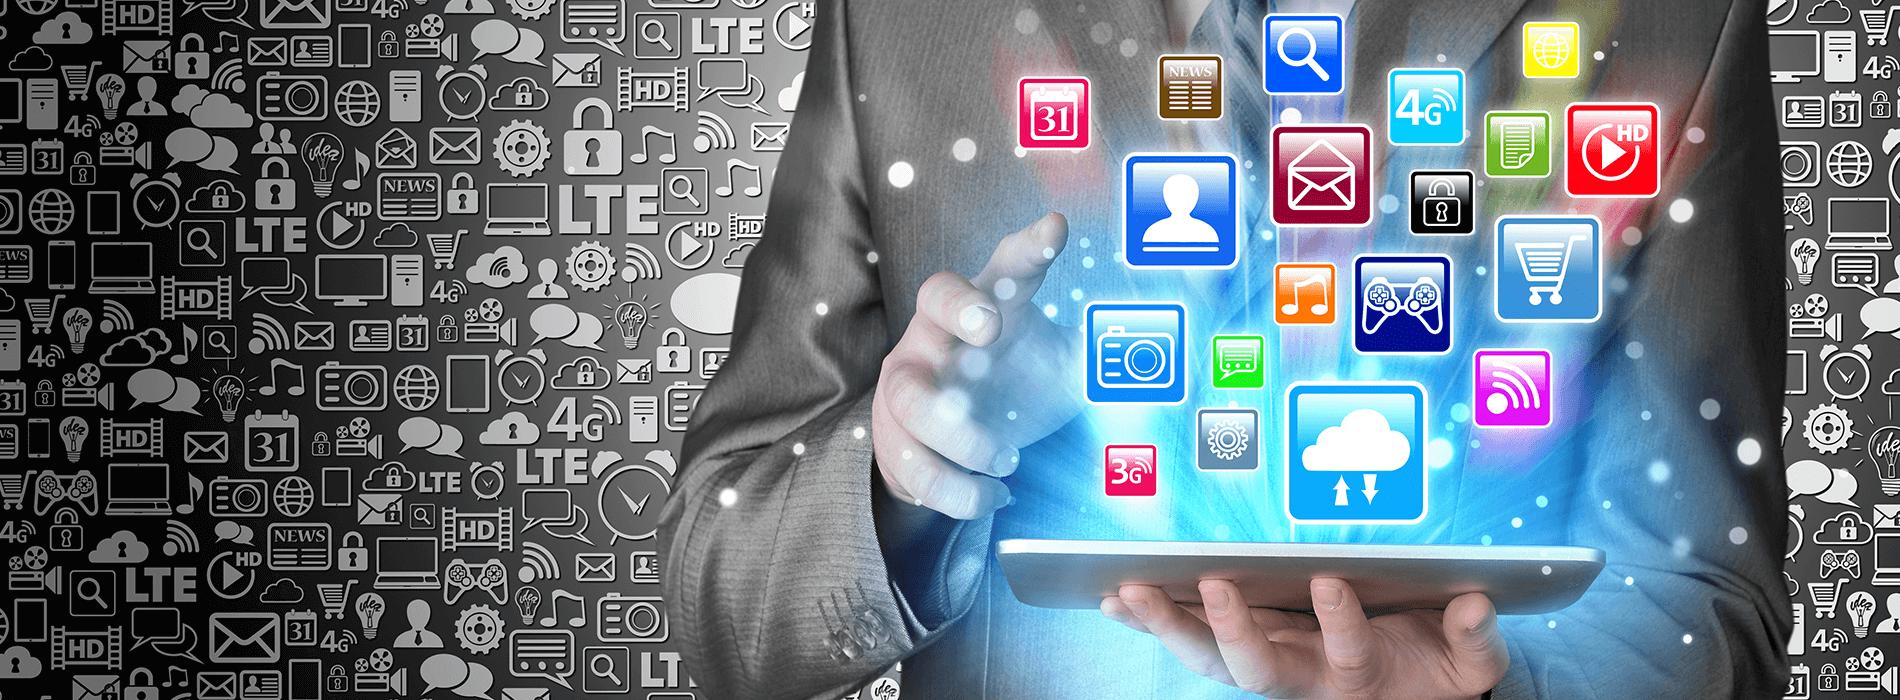 Saber Data Photo: Software Development Solutions